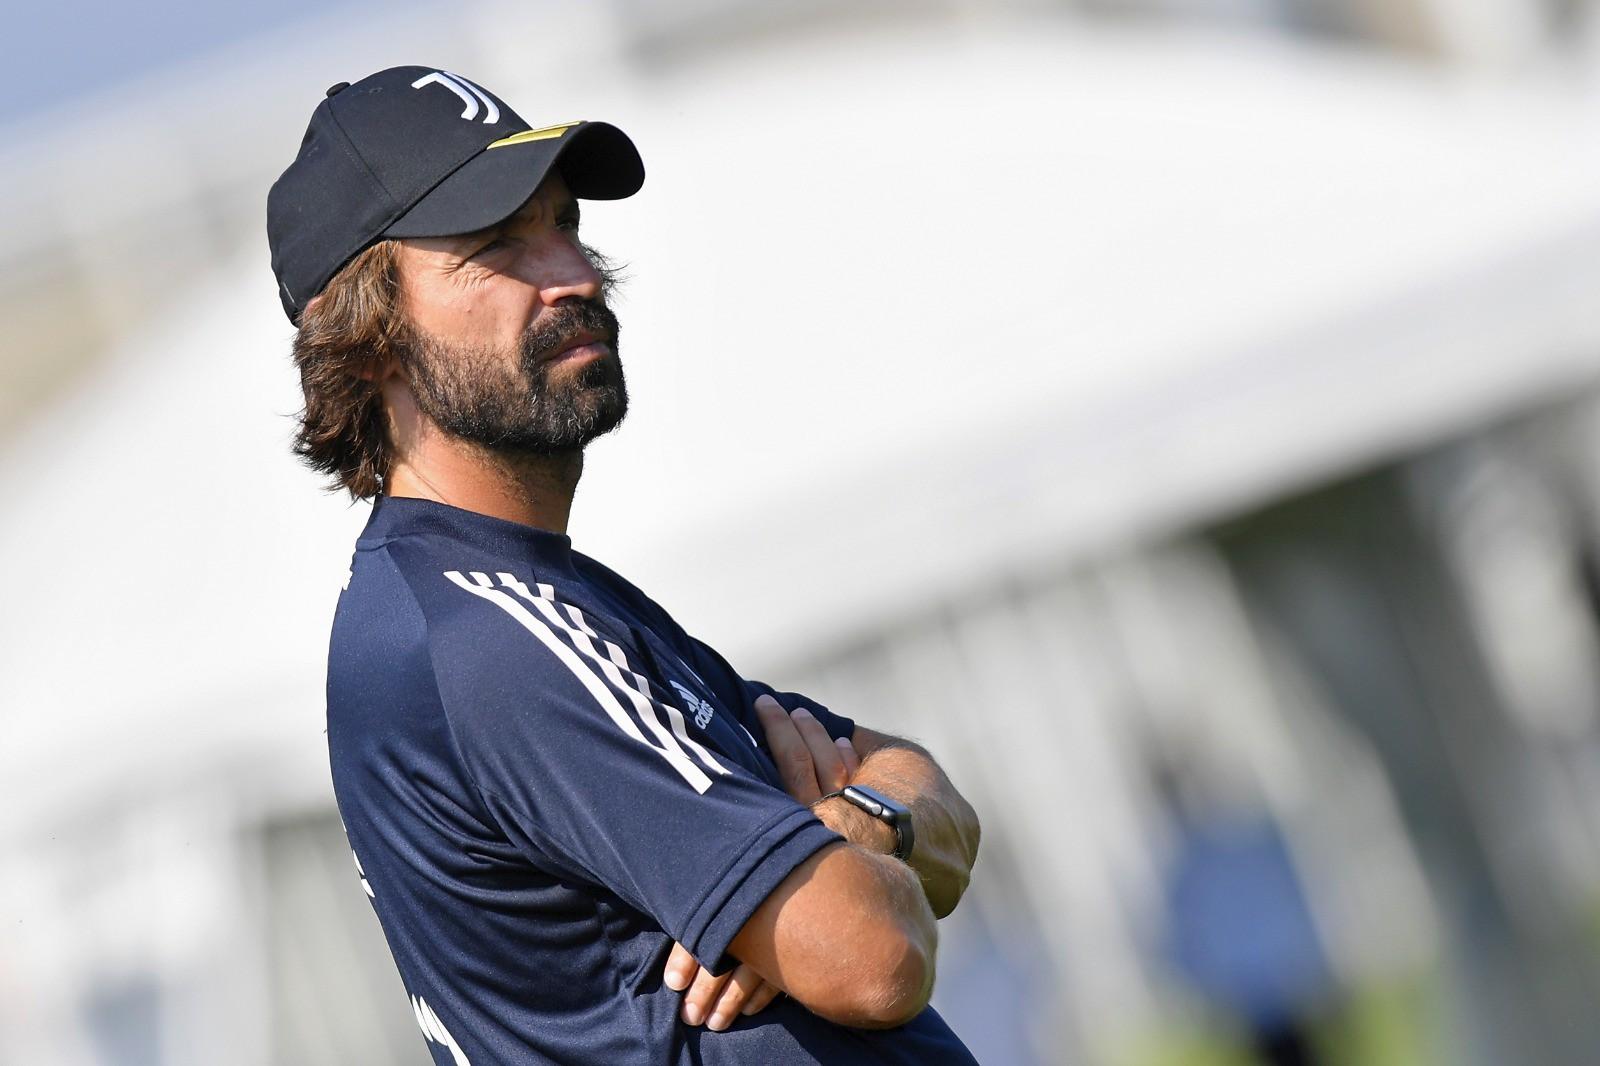 Juve-Novara, probabili formazioni: Pirlo pensa già alla Samp    Sport e Vai